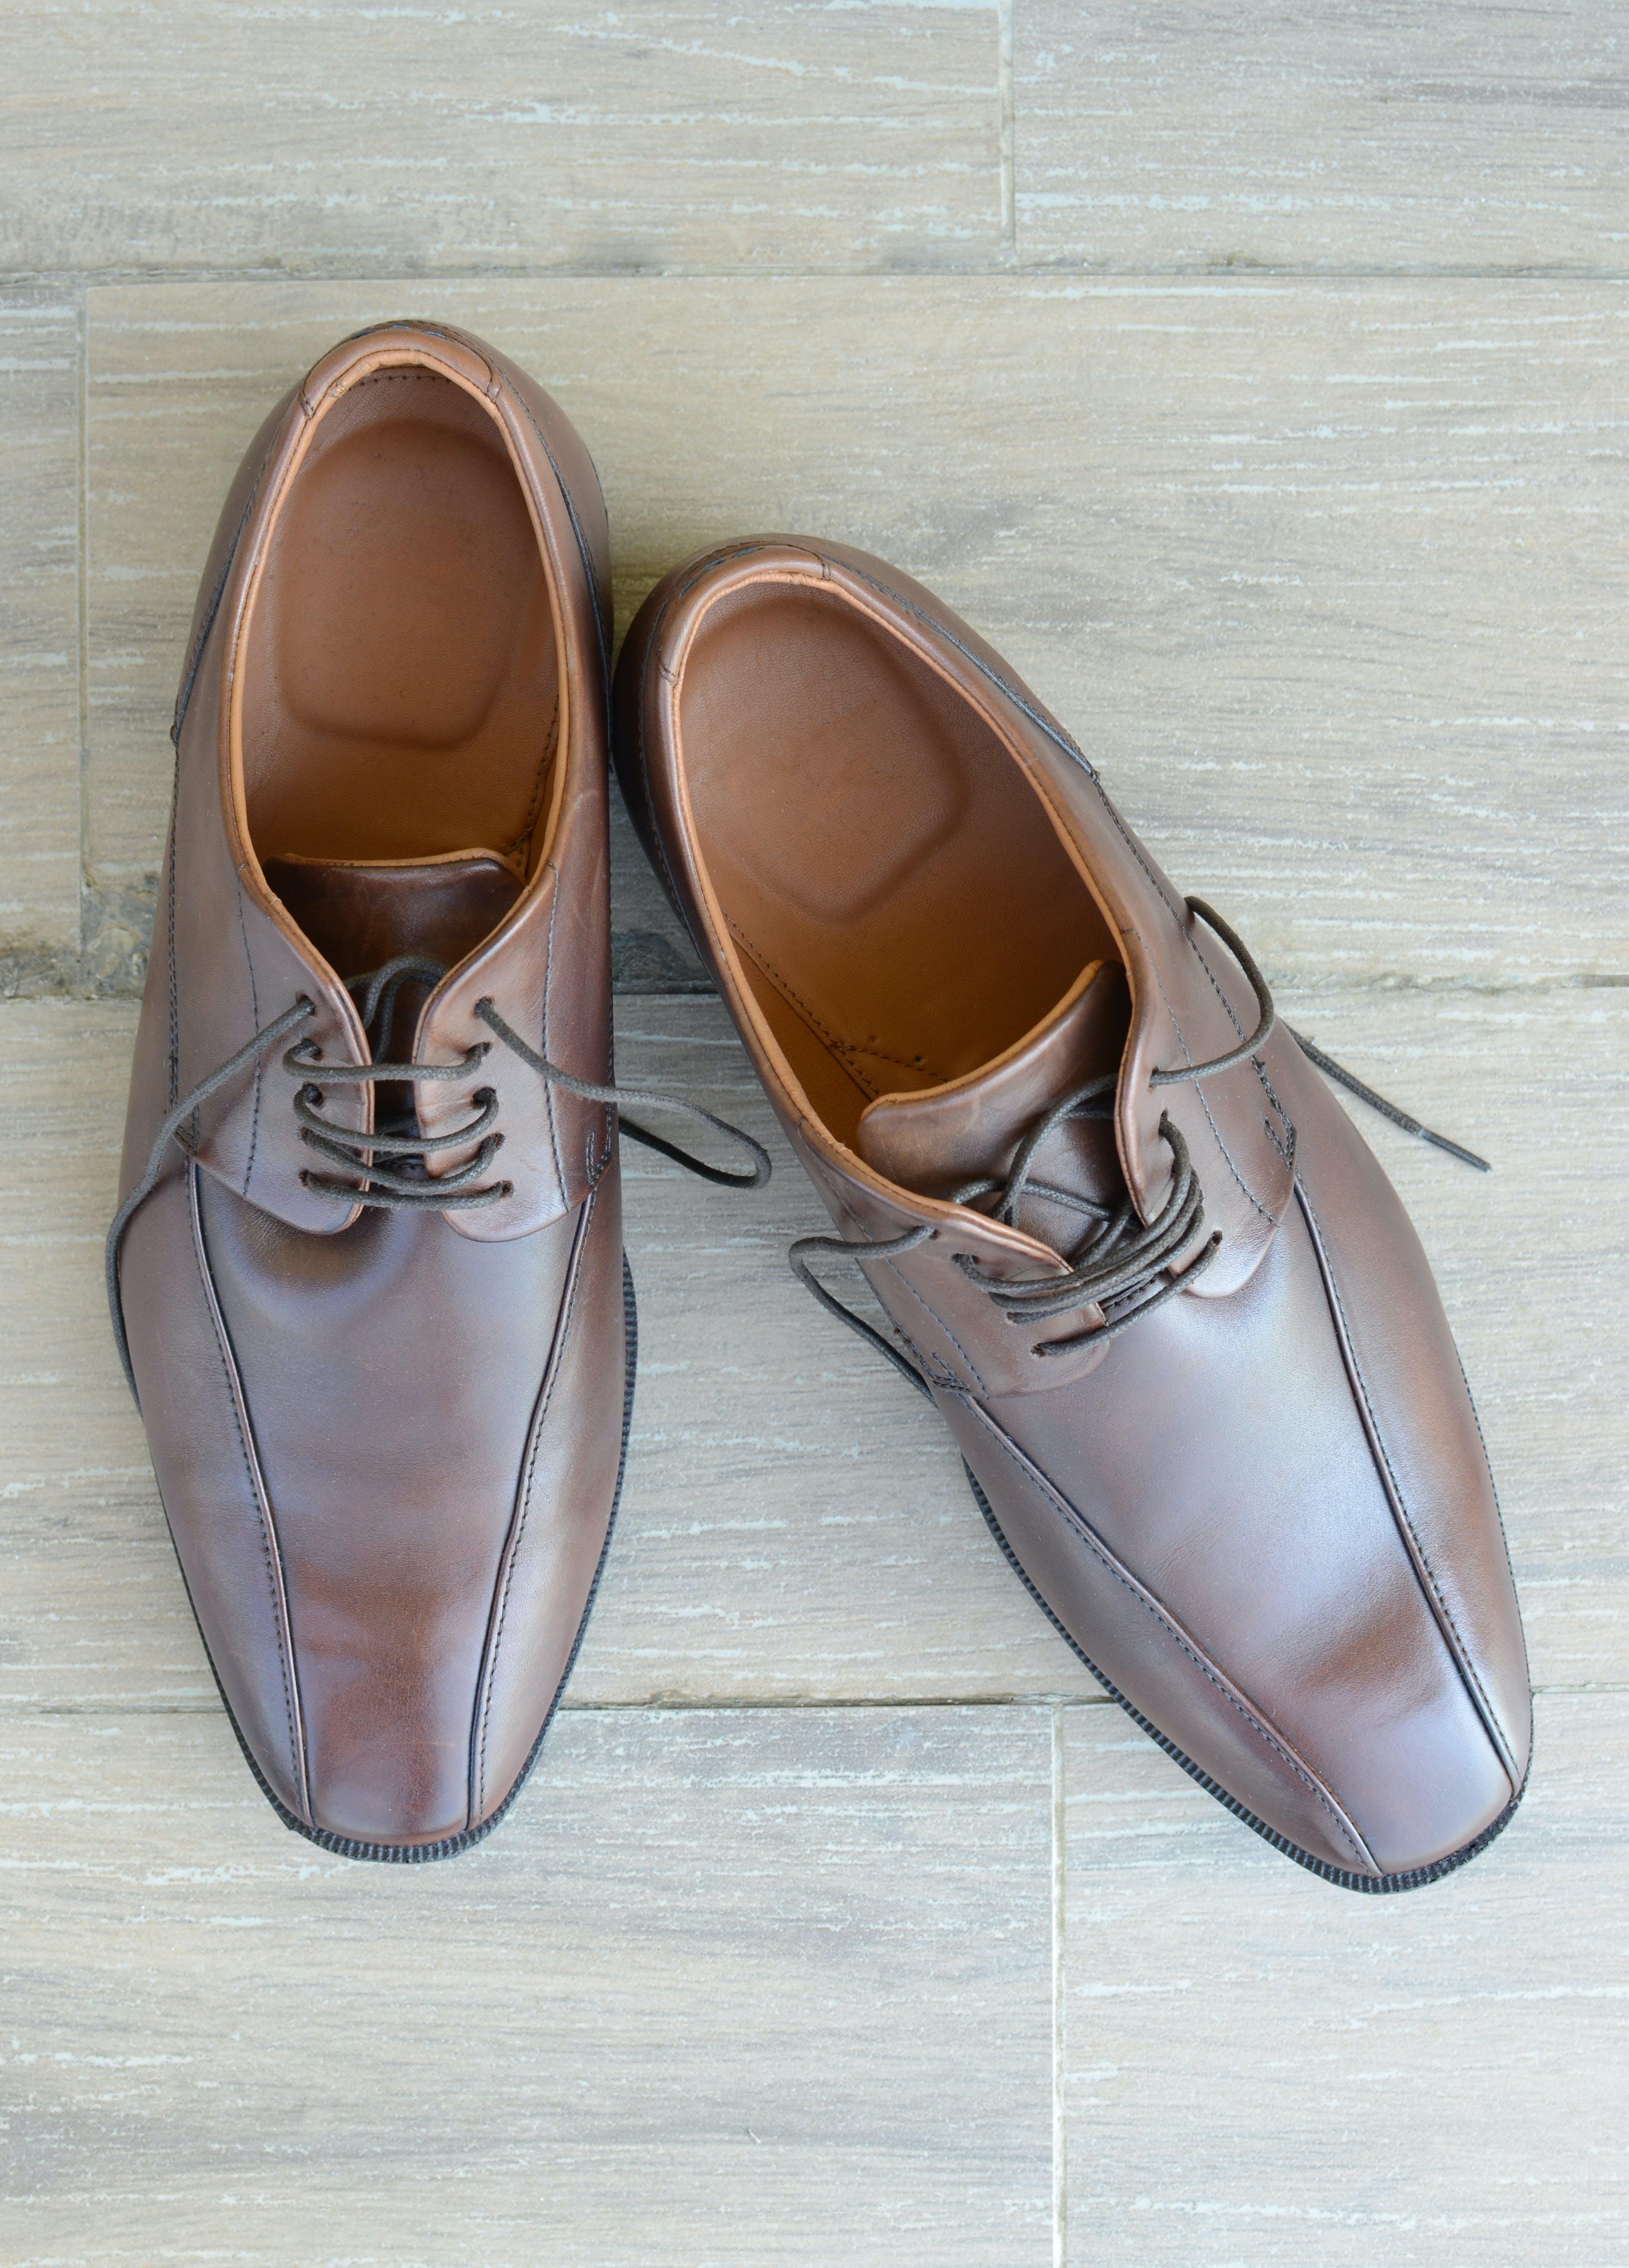 Gratis stockfoto met bruin, casual, duur, fashion